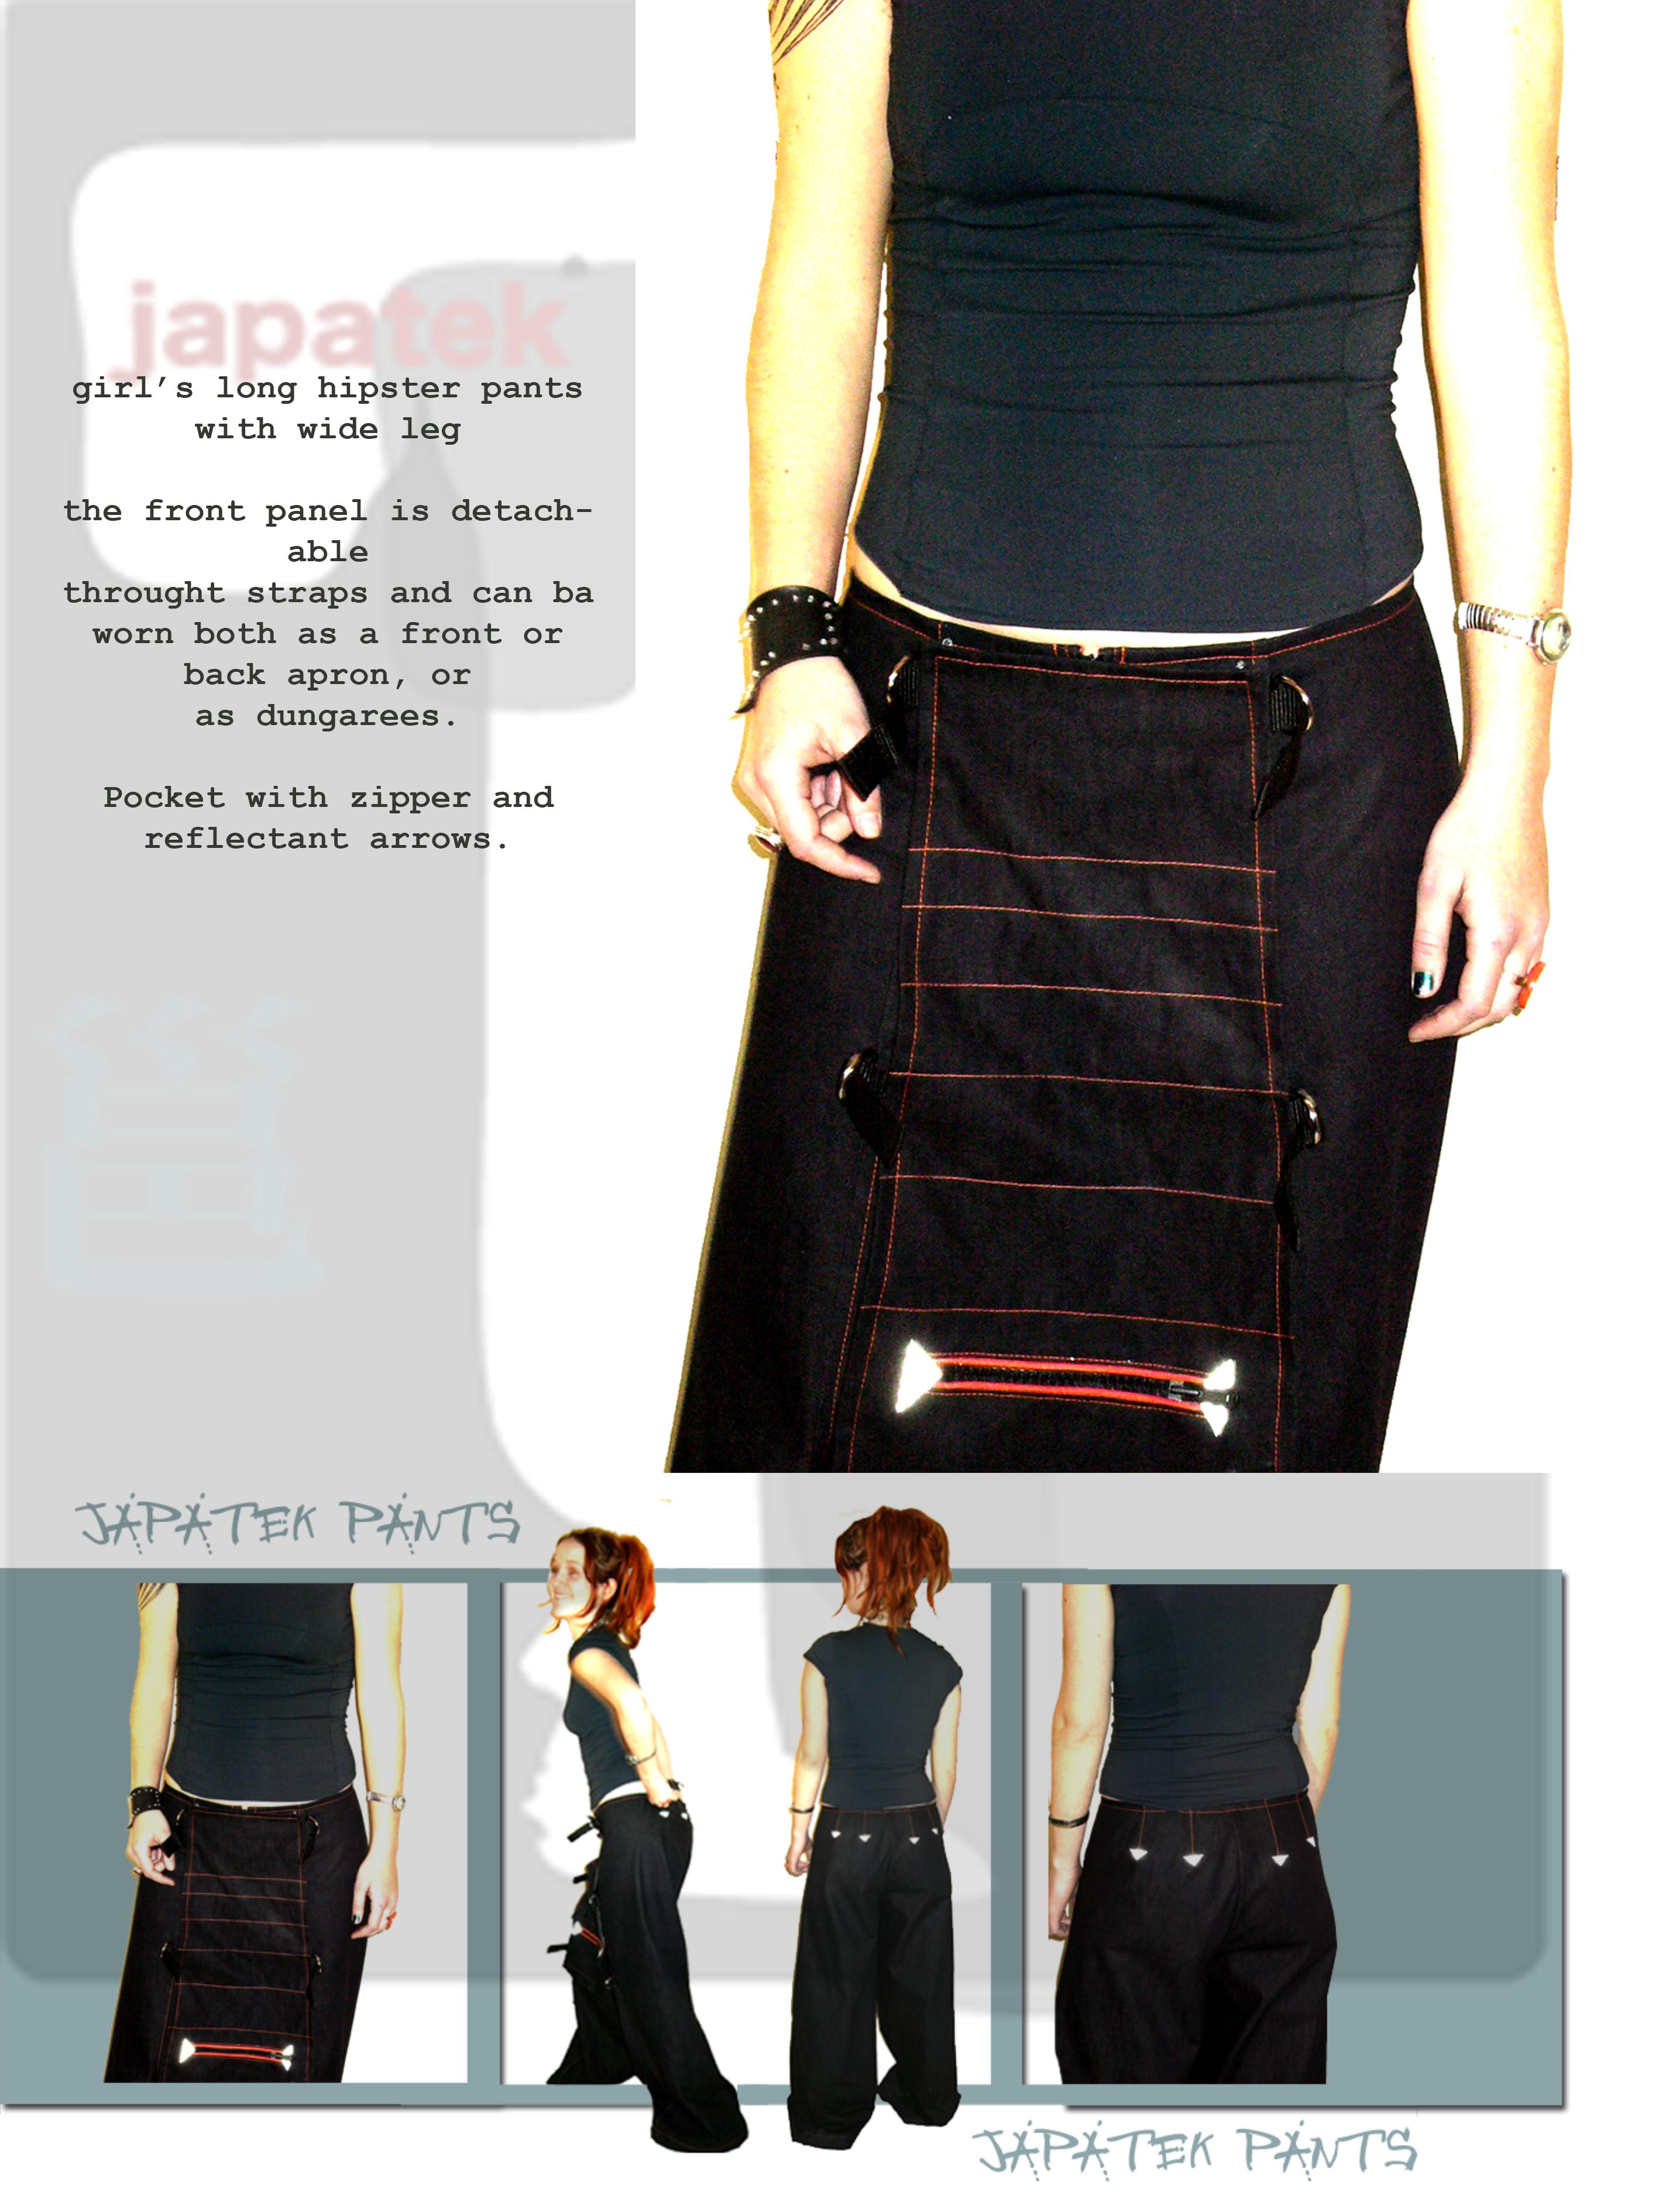 japatek+pants+board